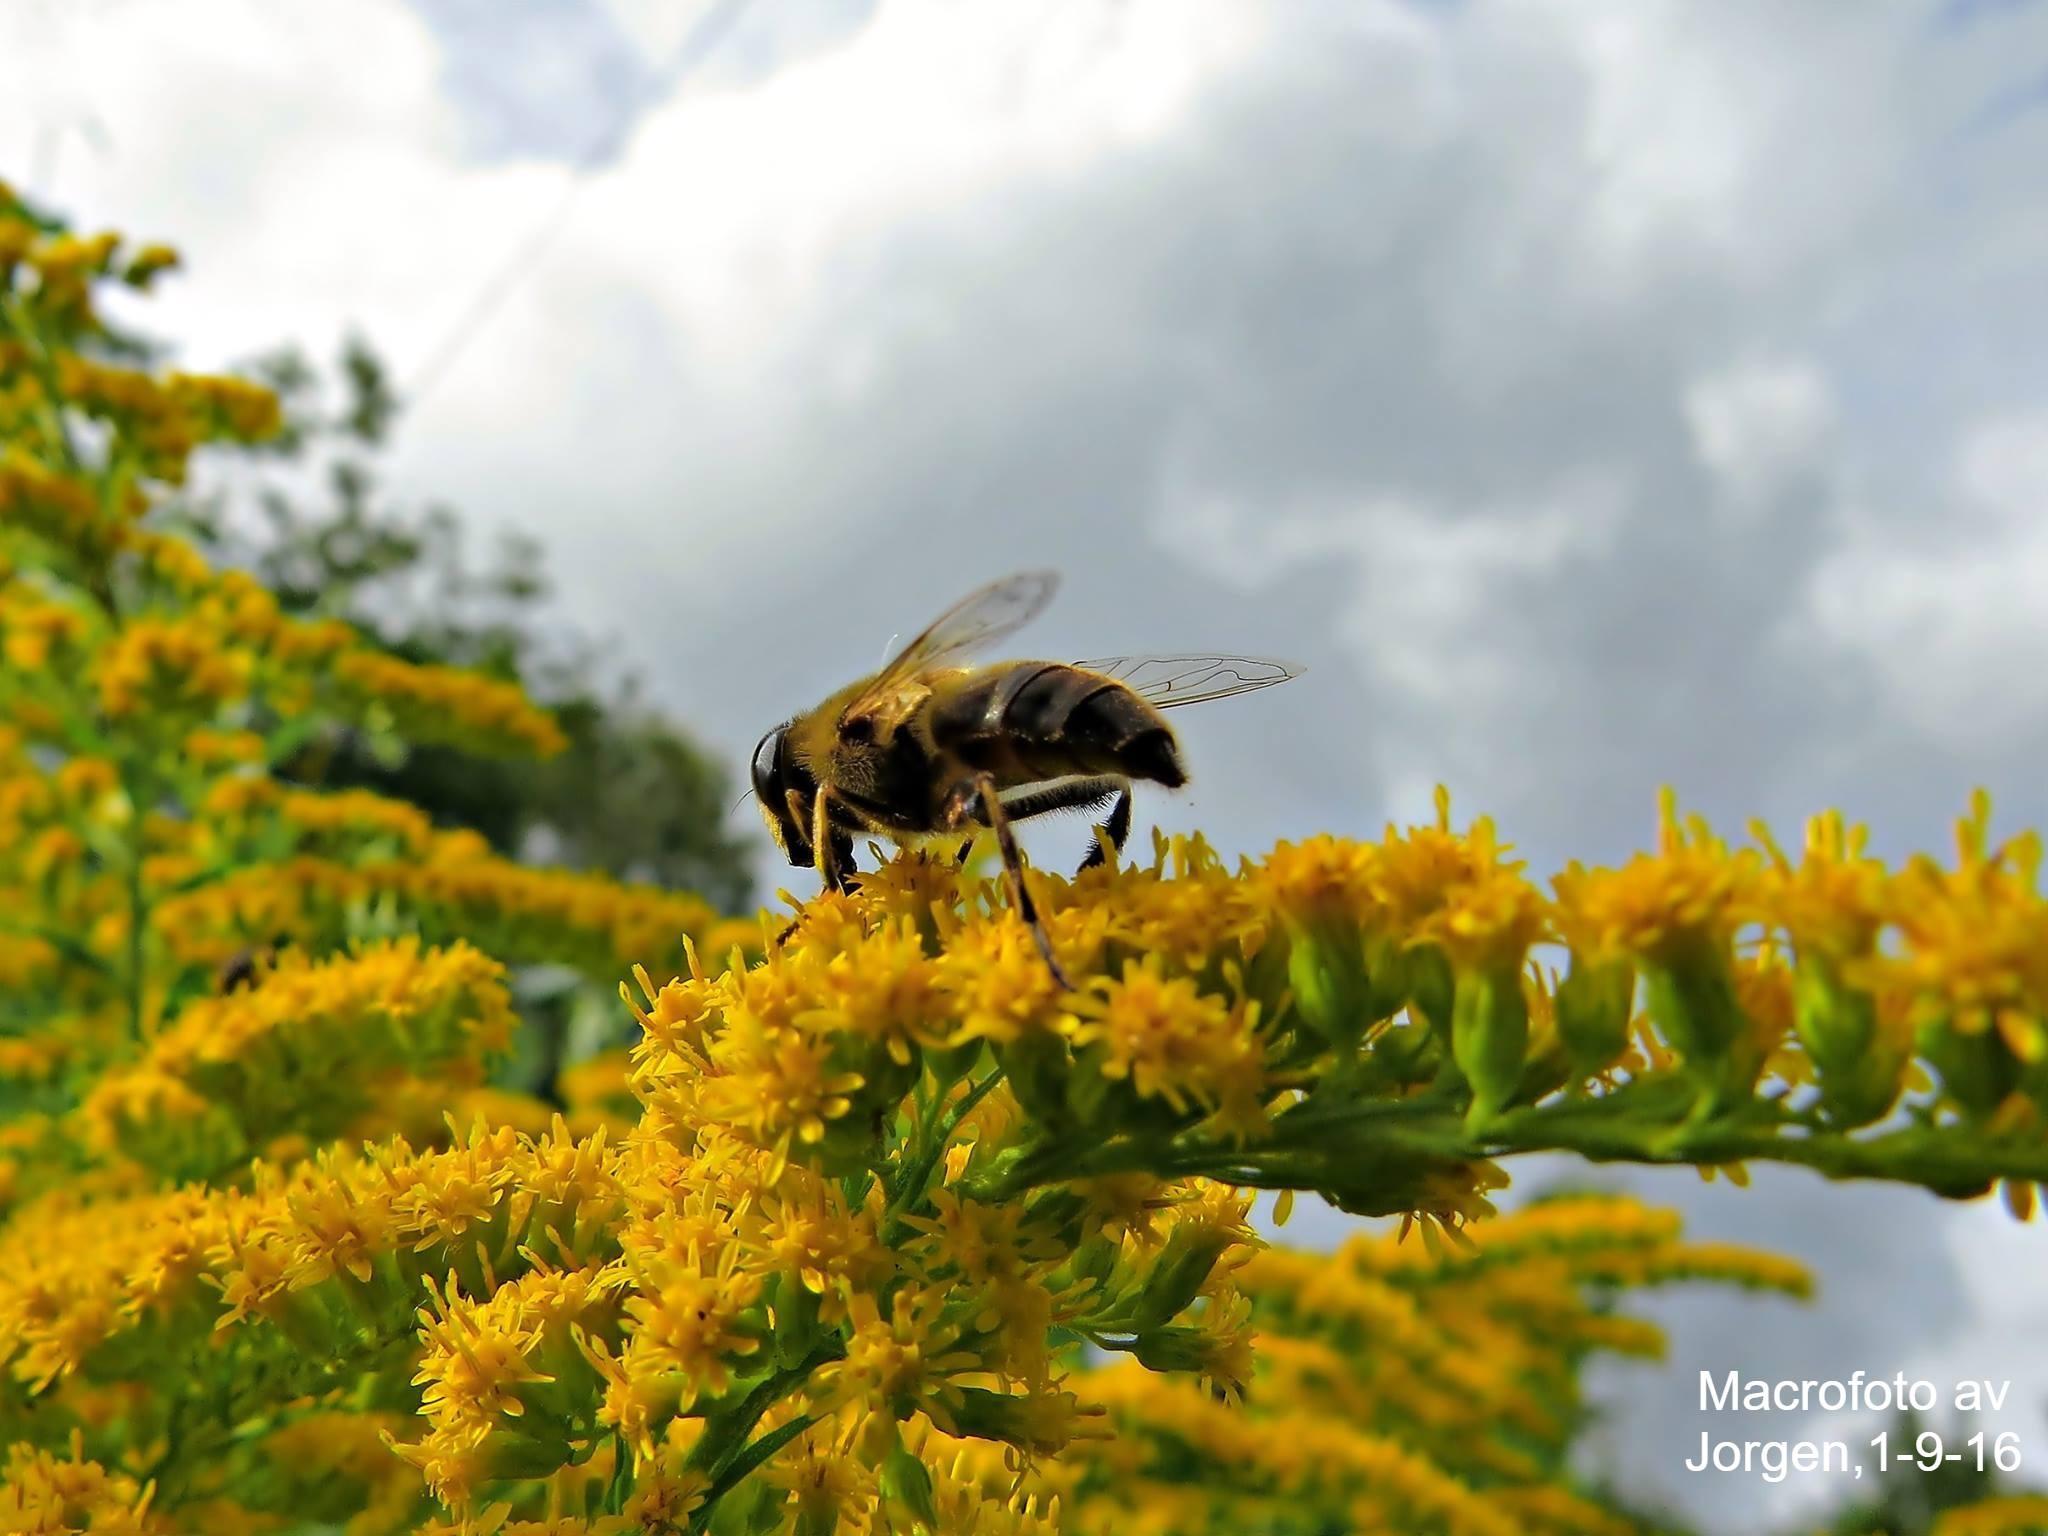 Wasp by hans.j.svensson